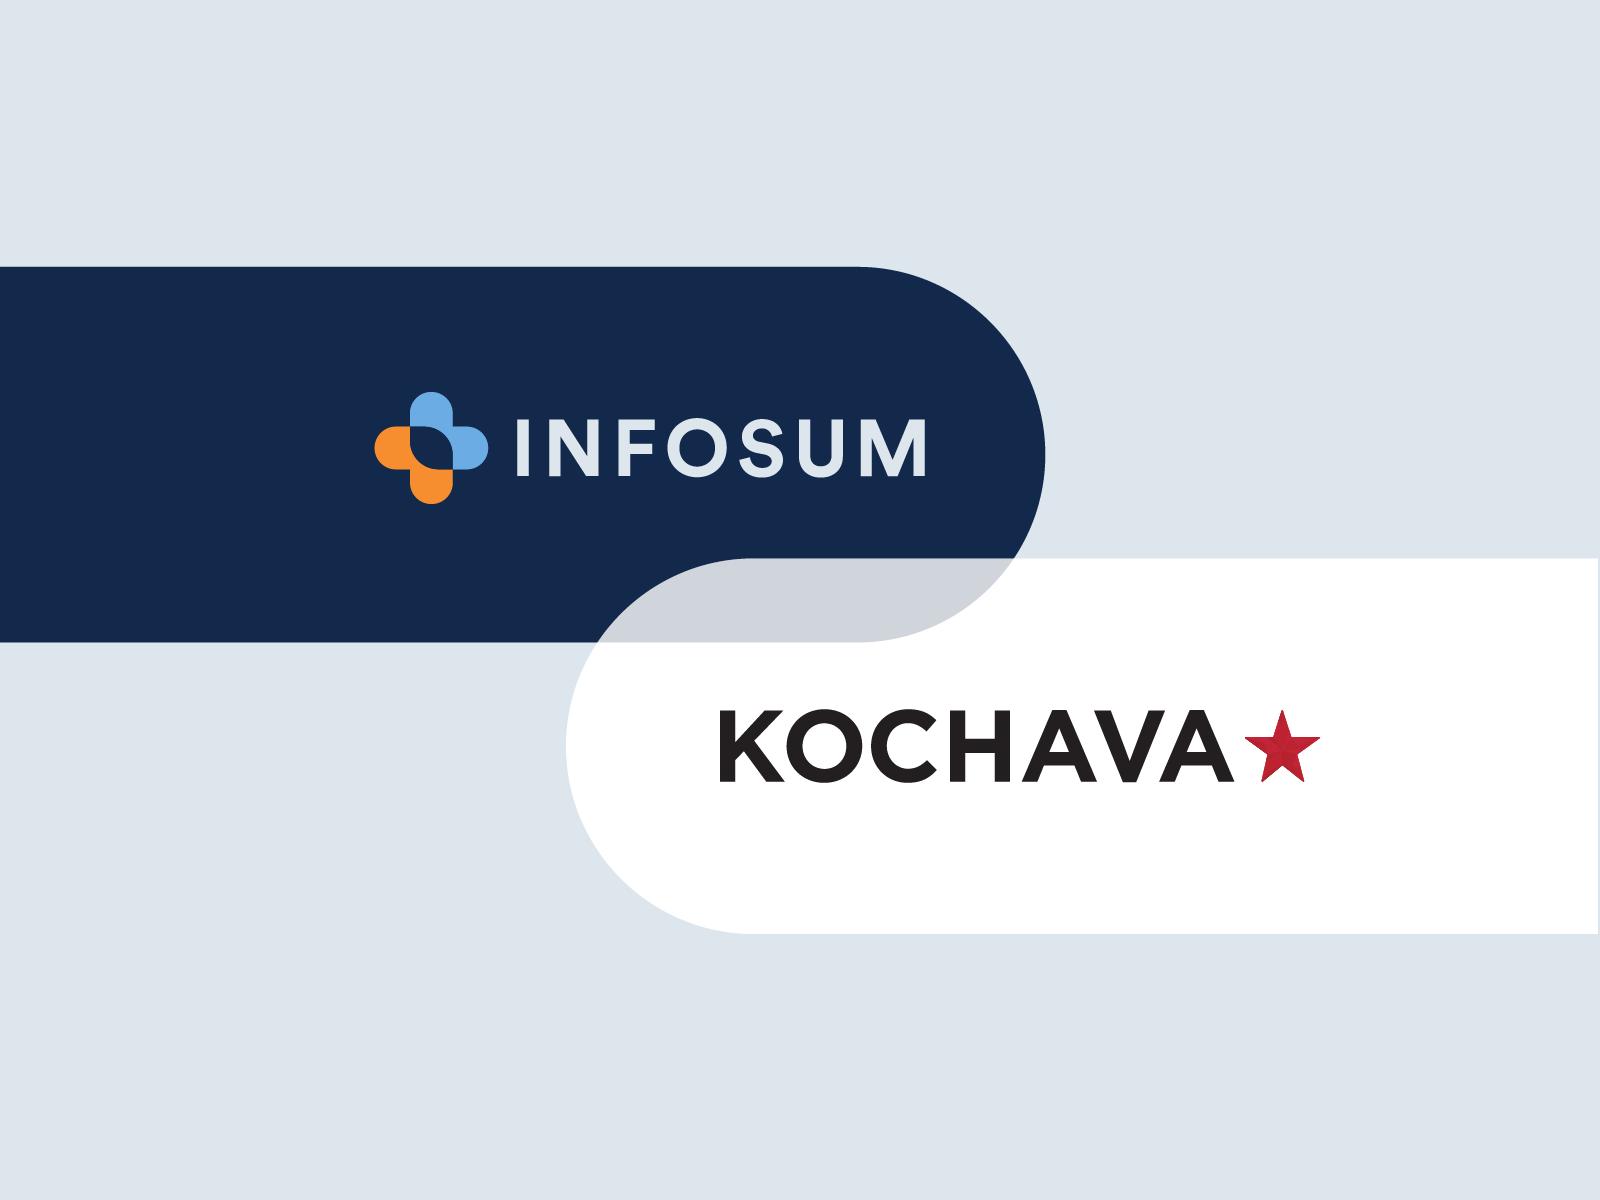 Kochava Collective and InfoSum Partner to Help Brands Drive Growth